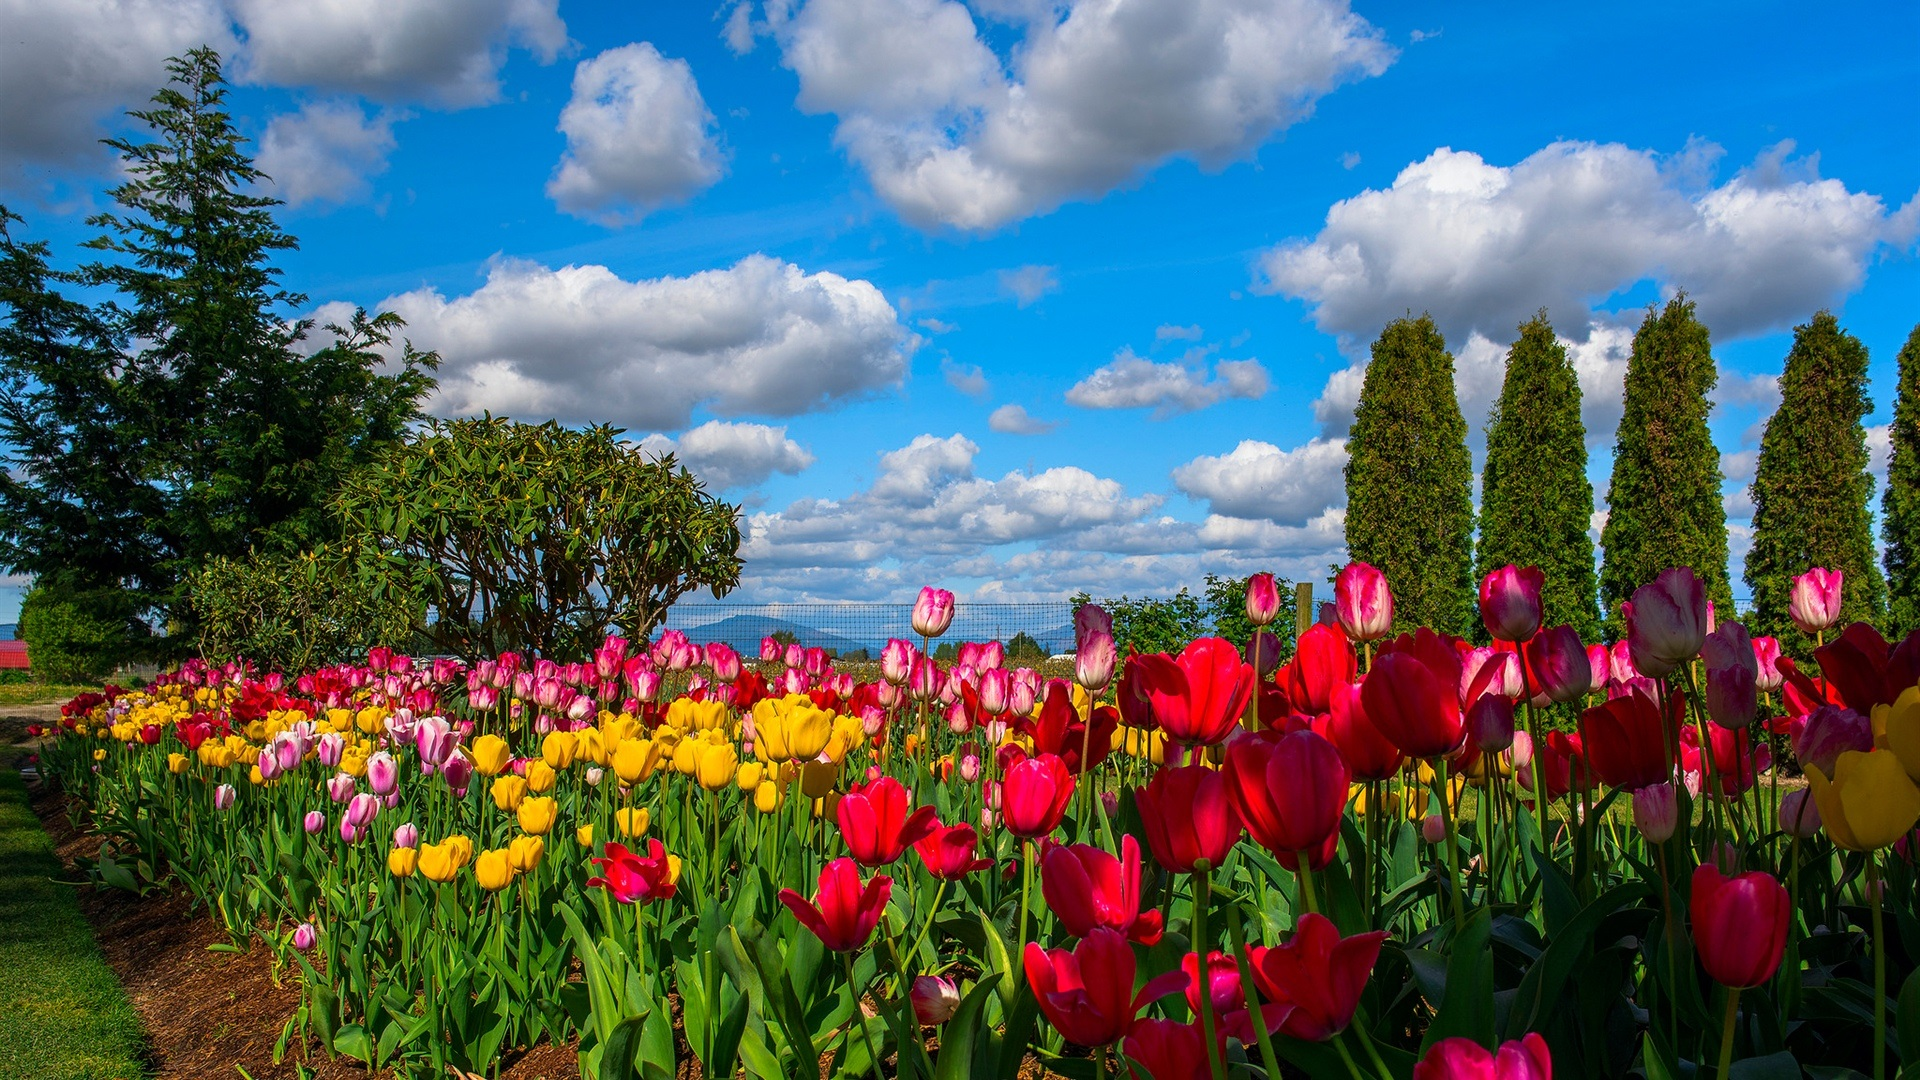 ... campo, árboles, cielo, nubes Fondos de pantalla - 1920x1080 Full HD Hd Wallpaper 1920x1080